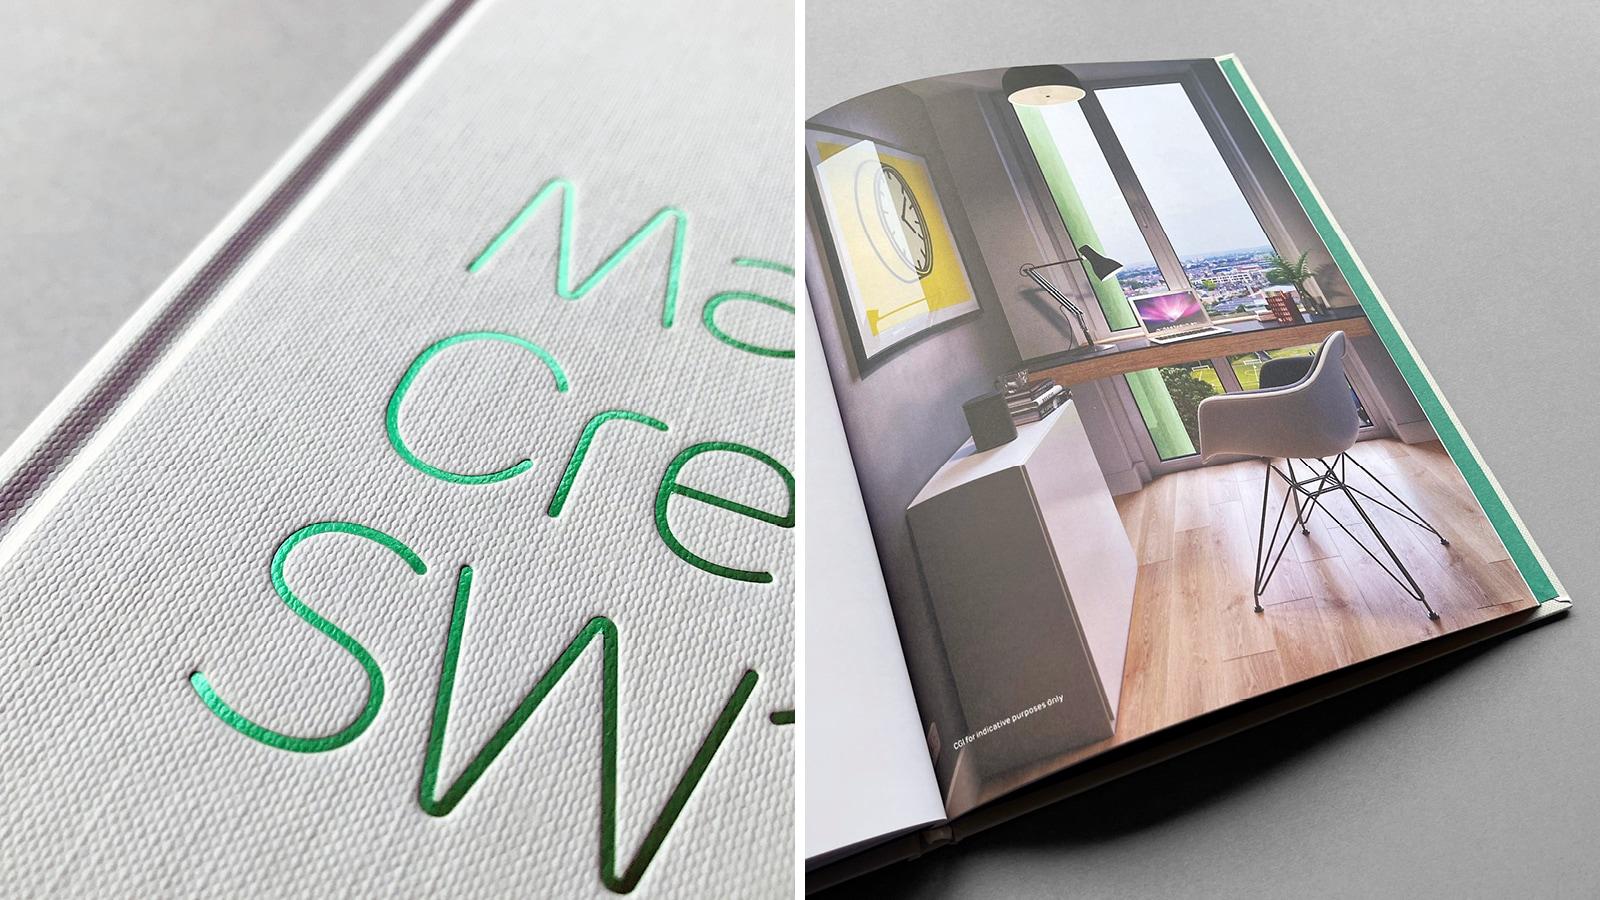 property-marketing-design-architecture-building-book-brochure-milton-keynes-london2